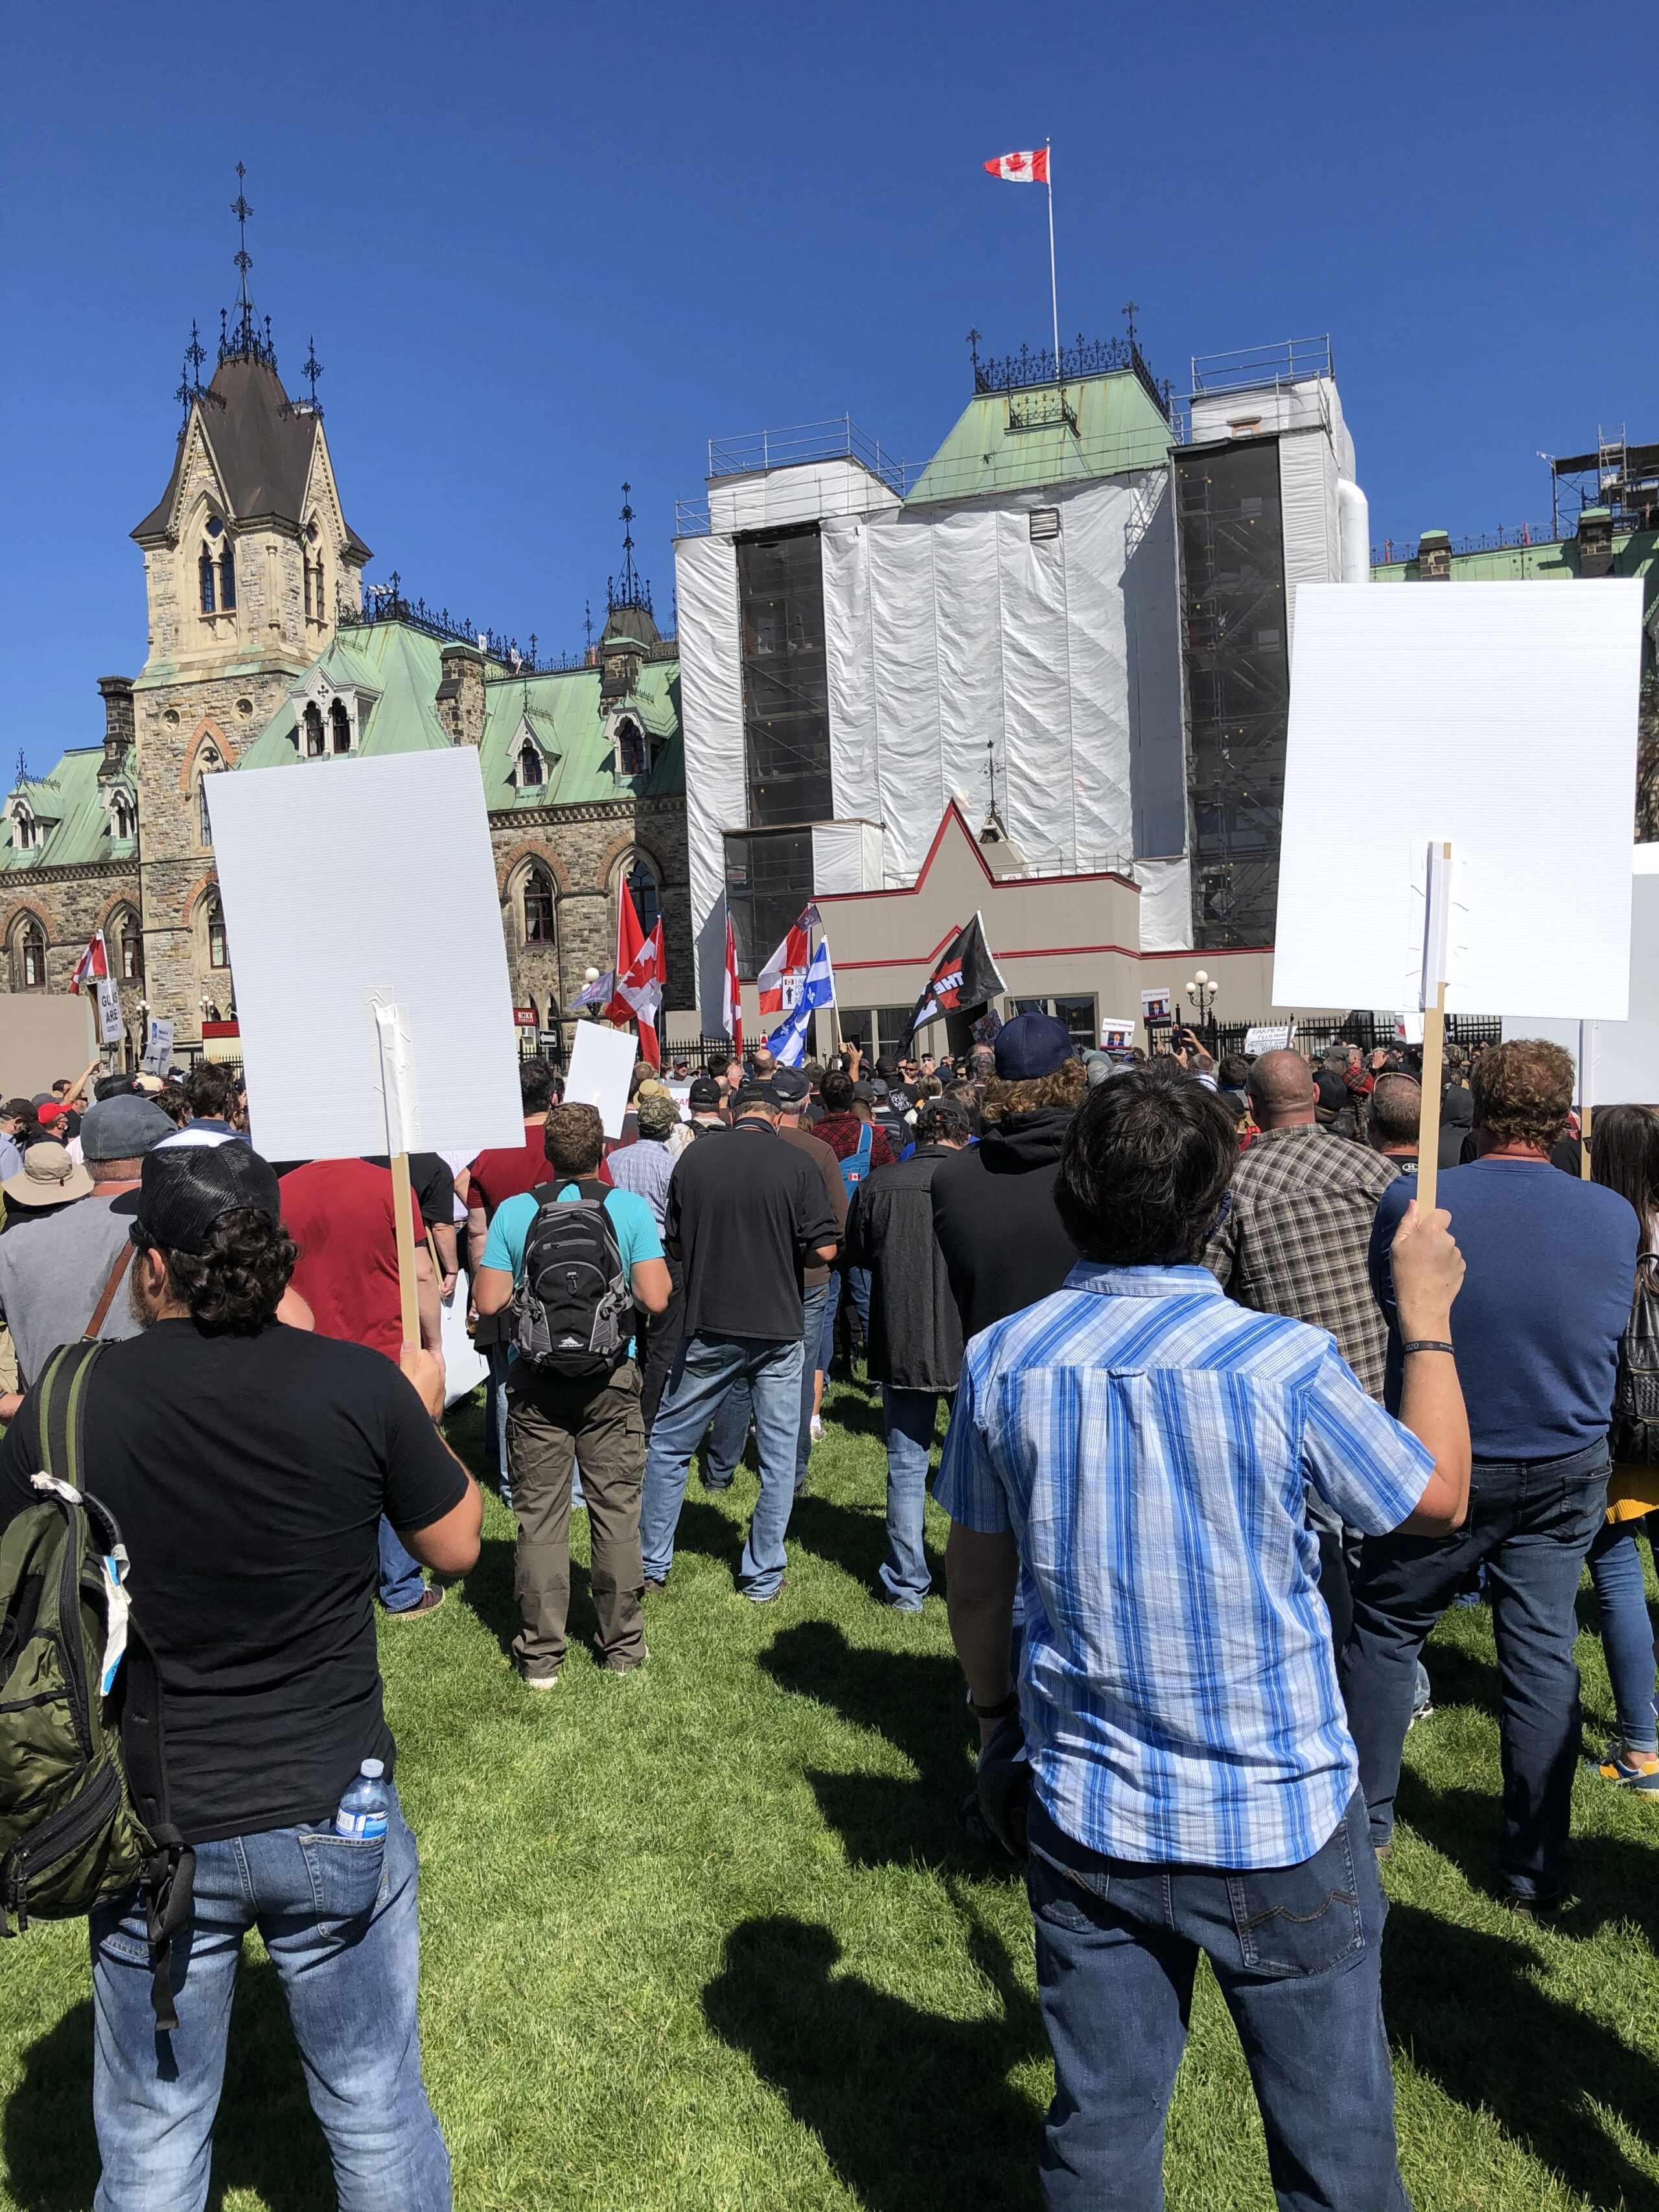 Manifestation CCFR à Ottawa le 12 sept 20 - Page 4 Img_5913